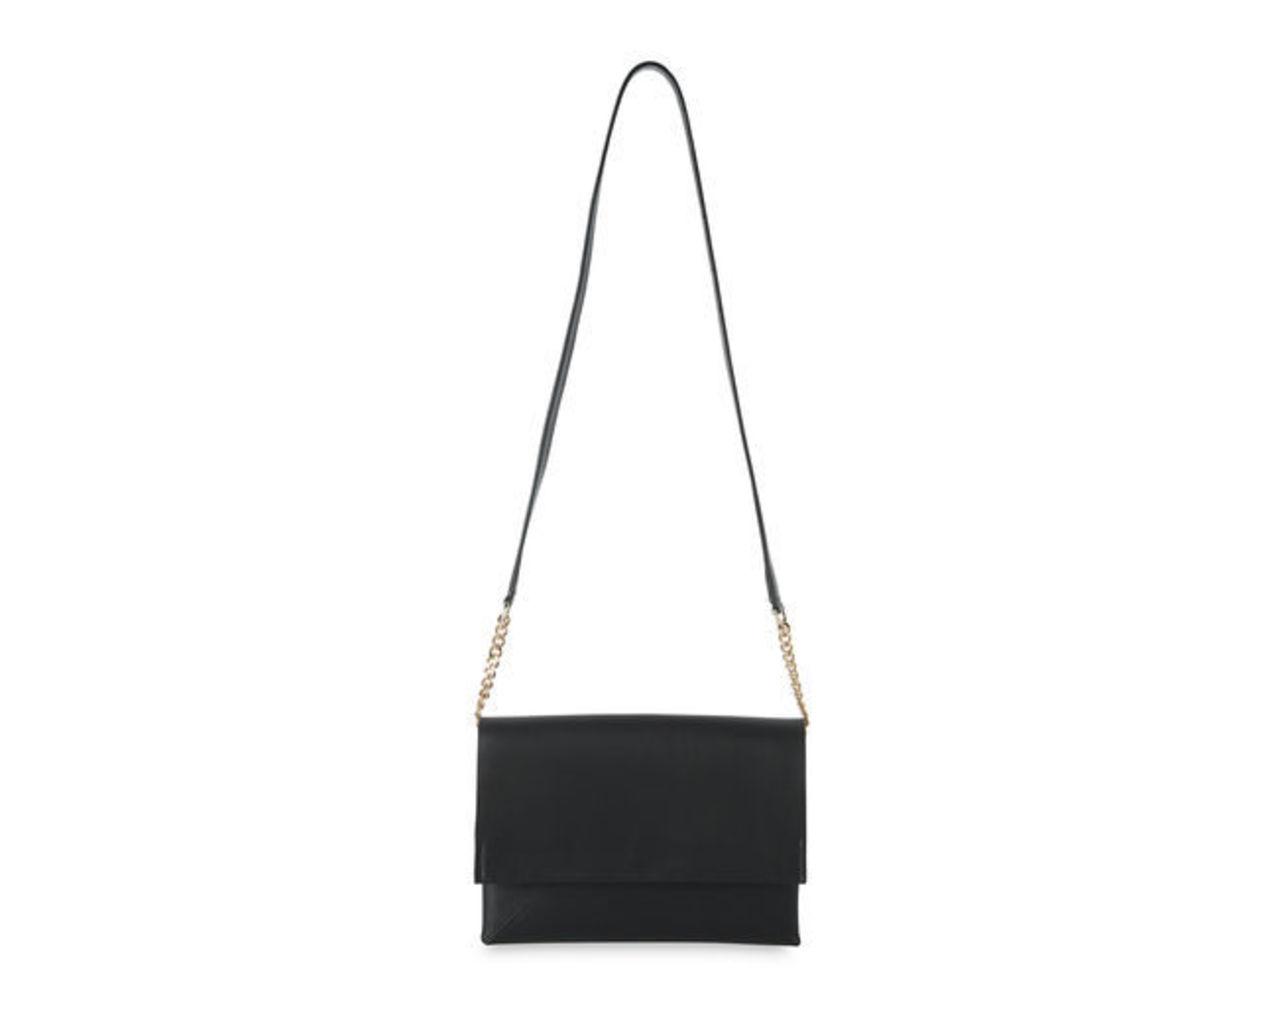 Hanley Double Crossbody Bag